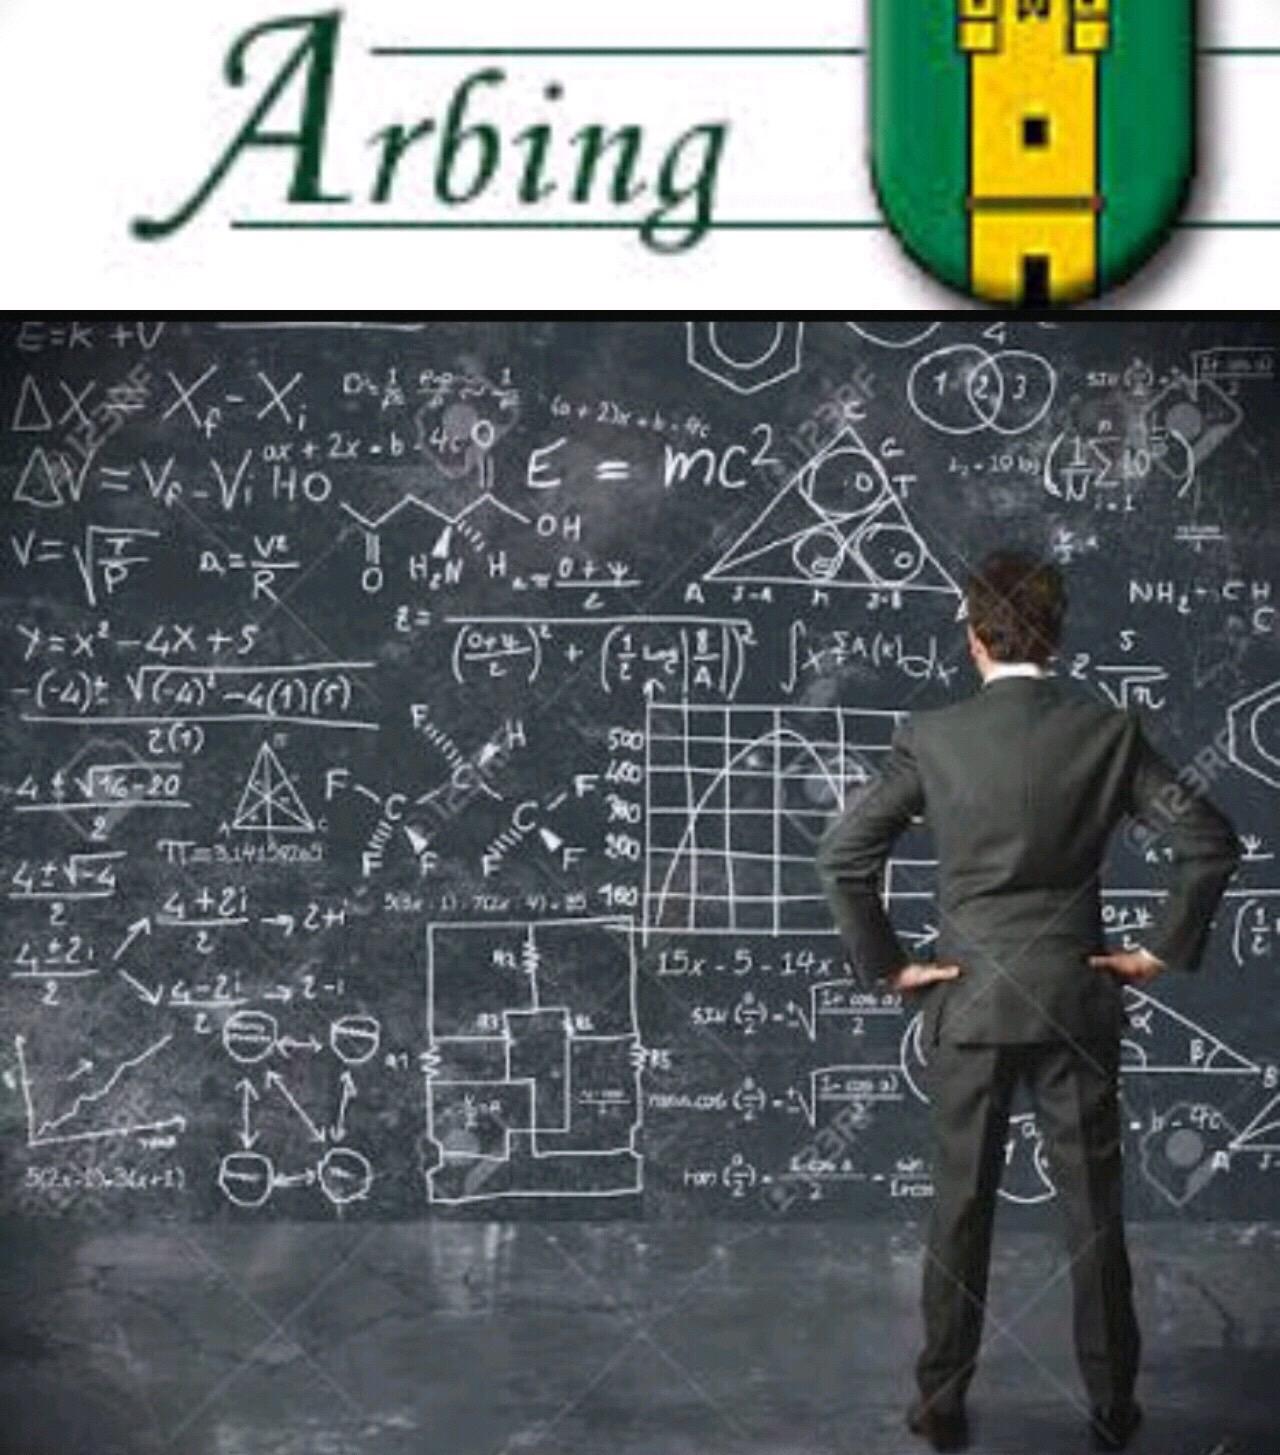 Arbing betting forum irish greyhound derby 2021 bettingadvice